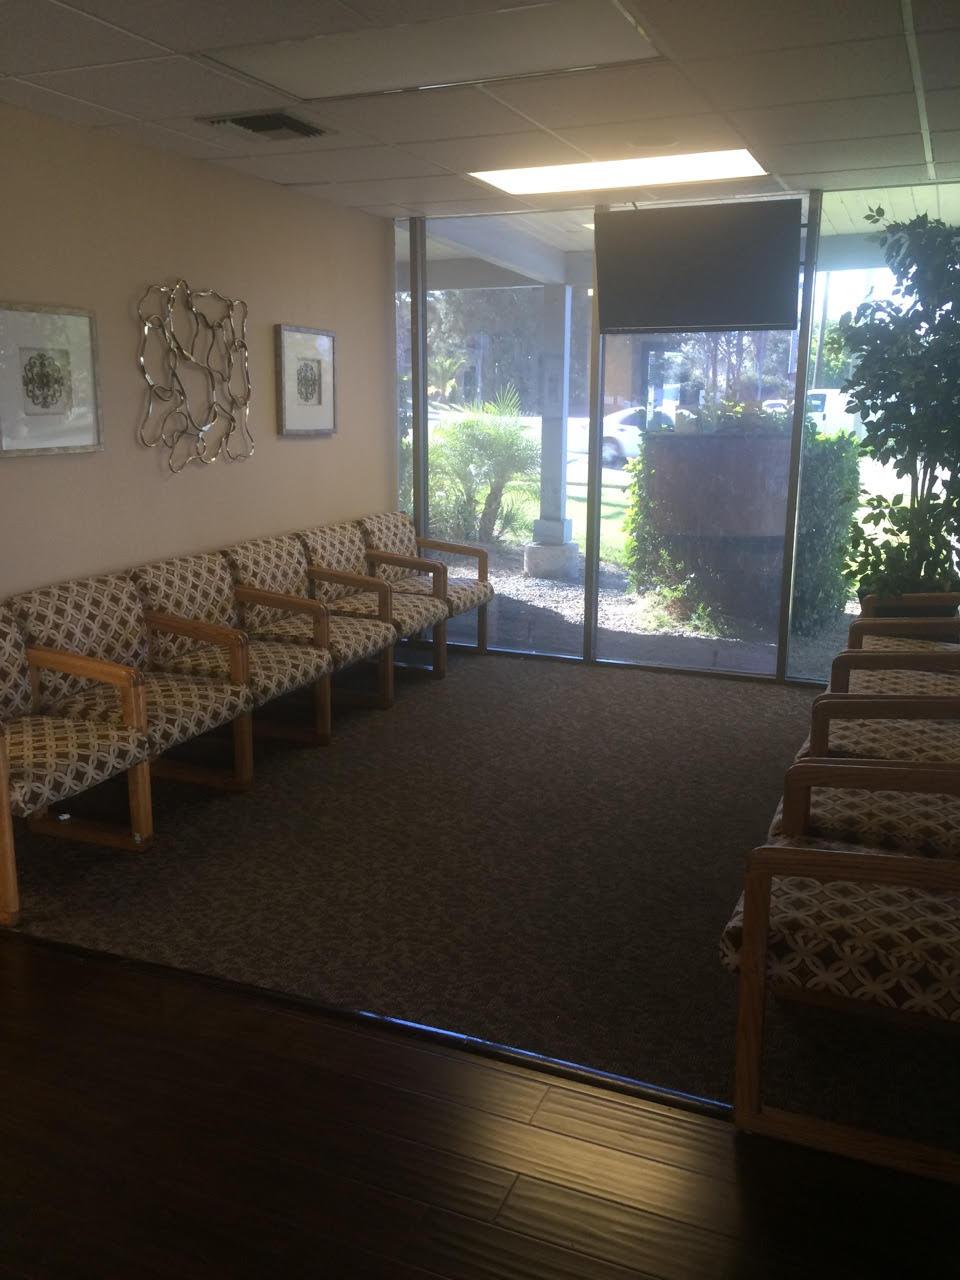 Ketcherside Orthodontics Inc. - dentist  | Photo 10 of 10 | Address: A-, 720 Magnolia Ave #1, Corona, CA 92879, USA | Phone: (951) 737-3800